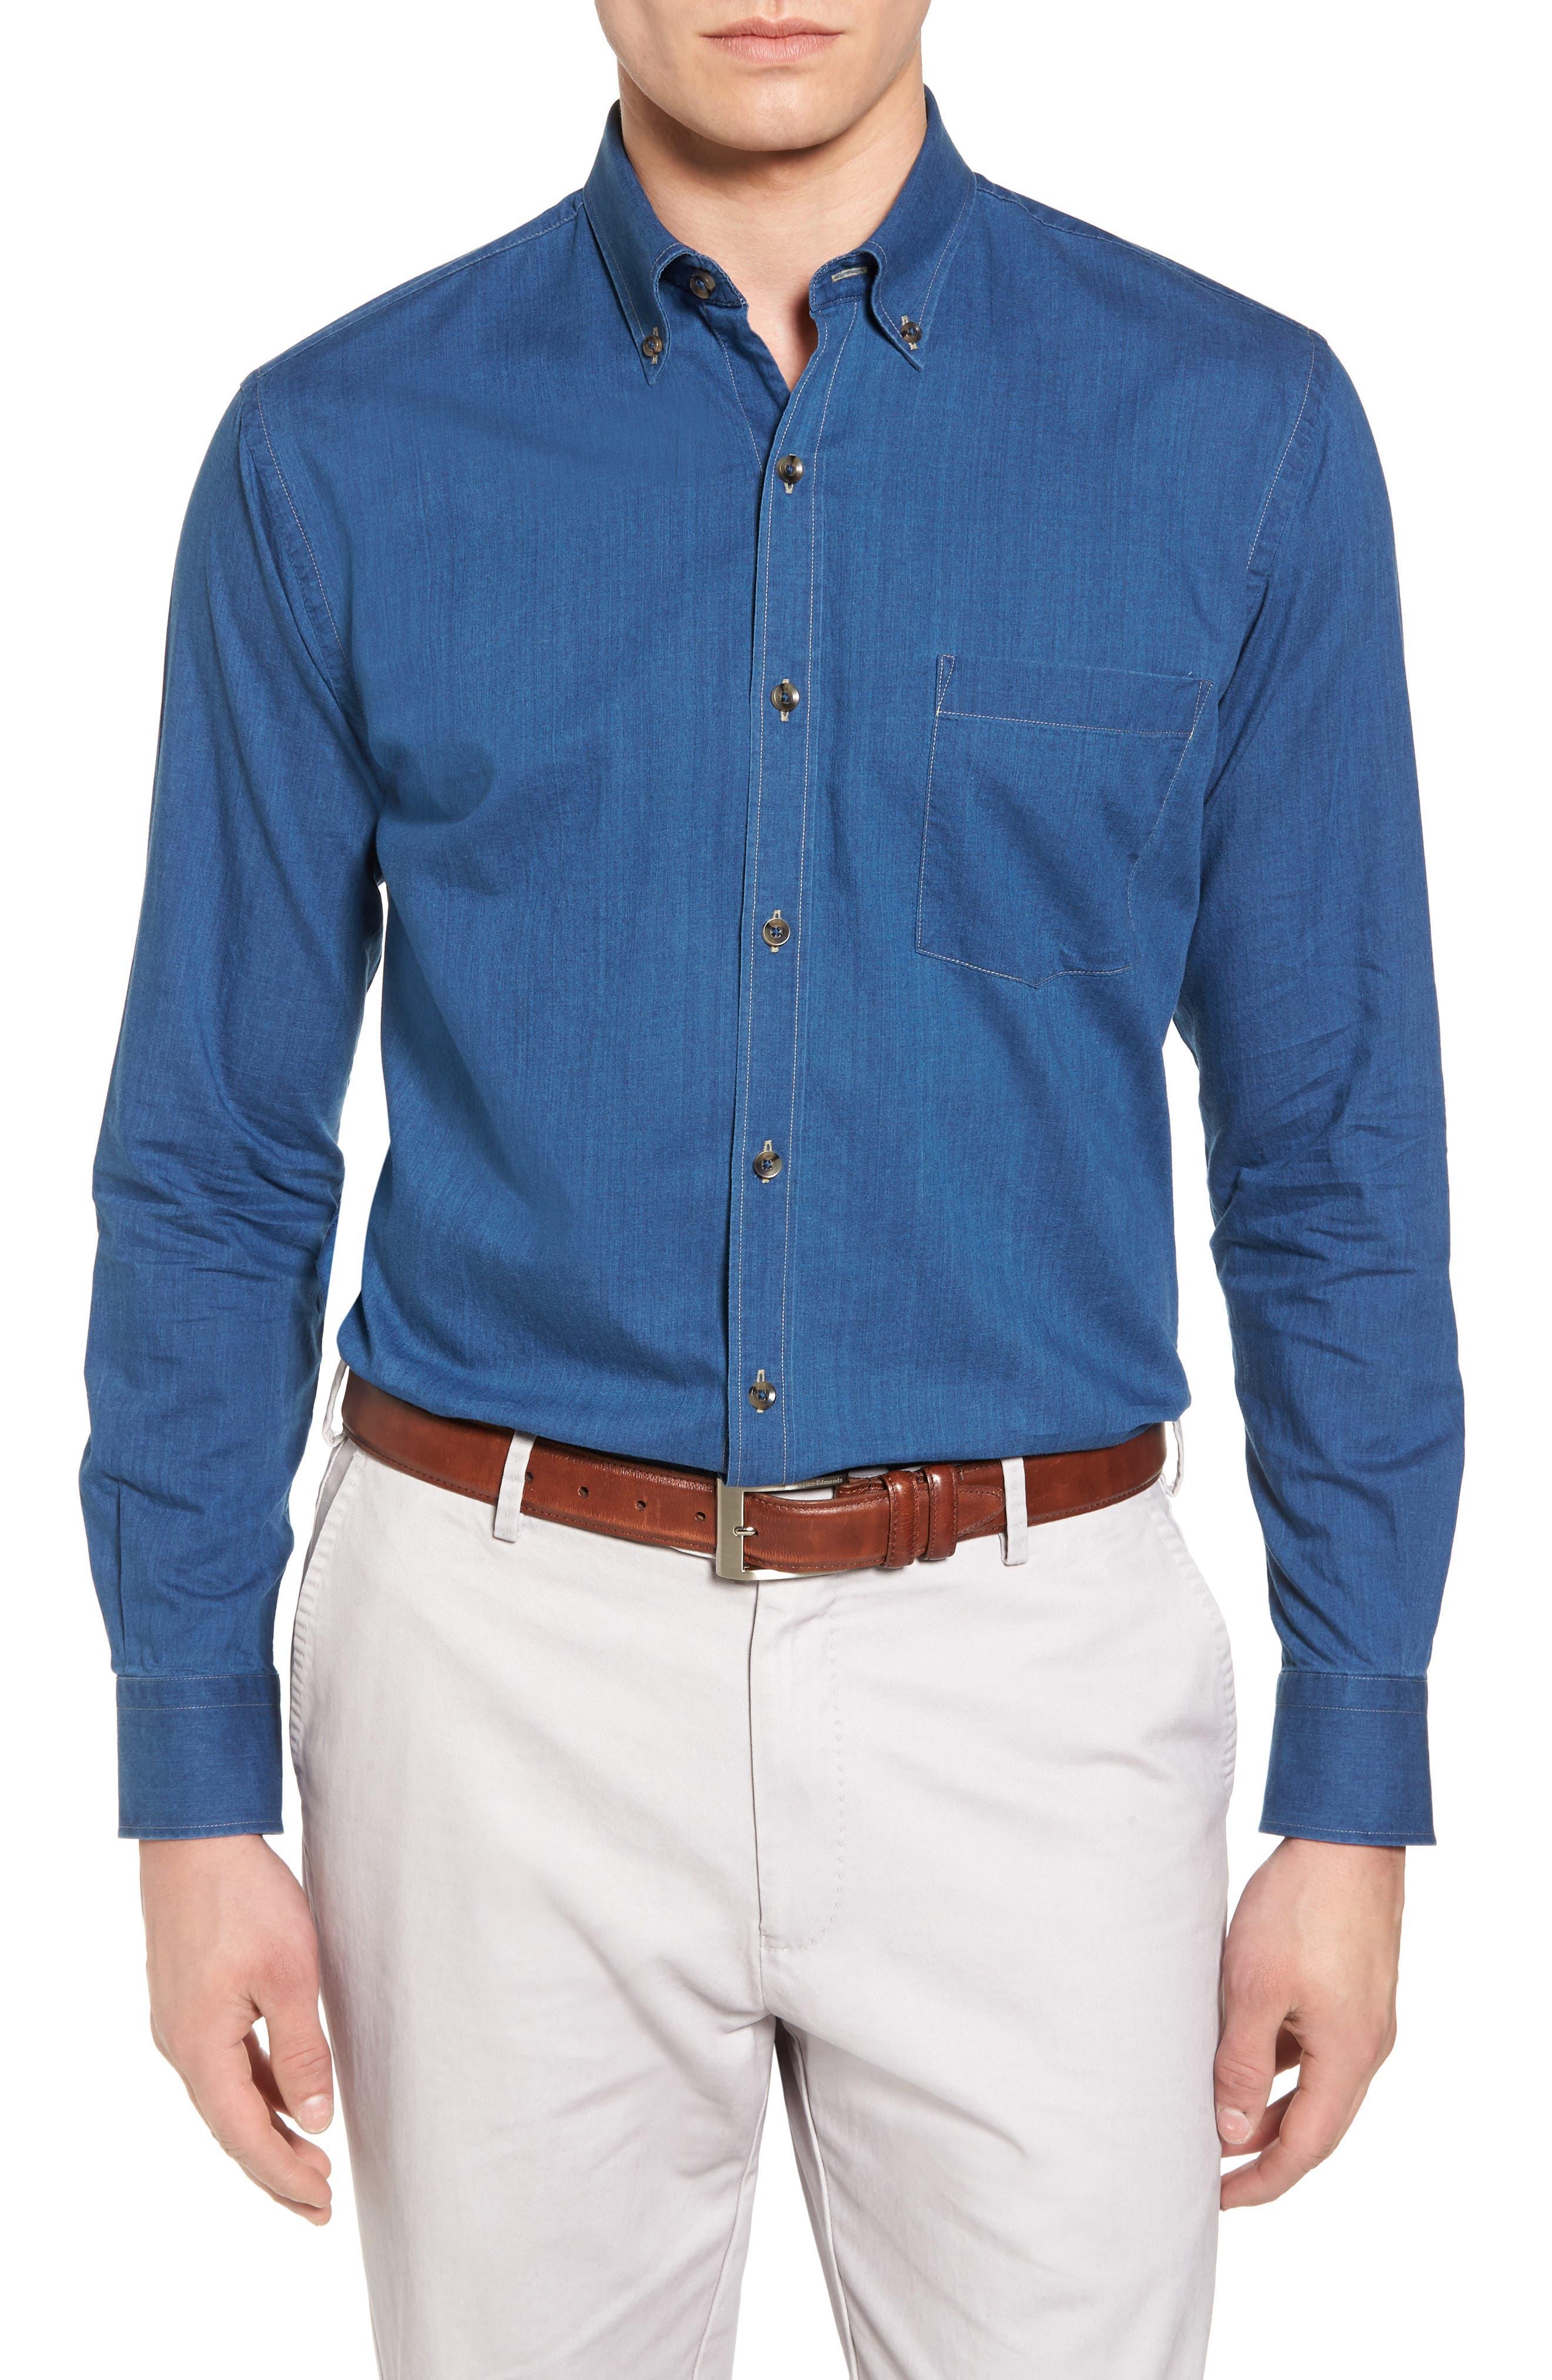 Crown Vintage Regular Fit Denim Sport Shirt,                             Main thumbnail 1, color,                             405